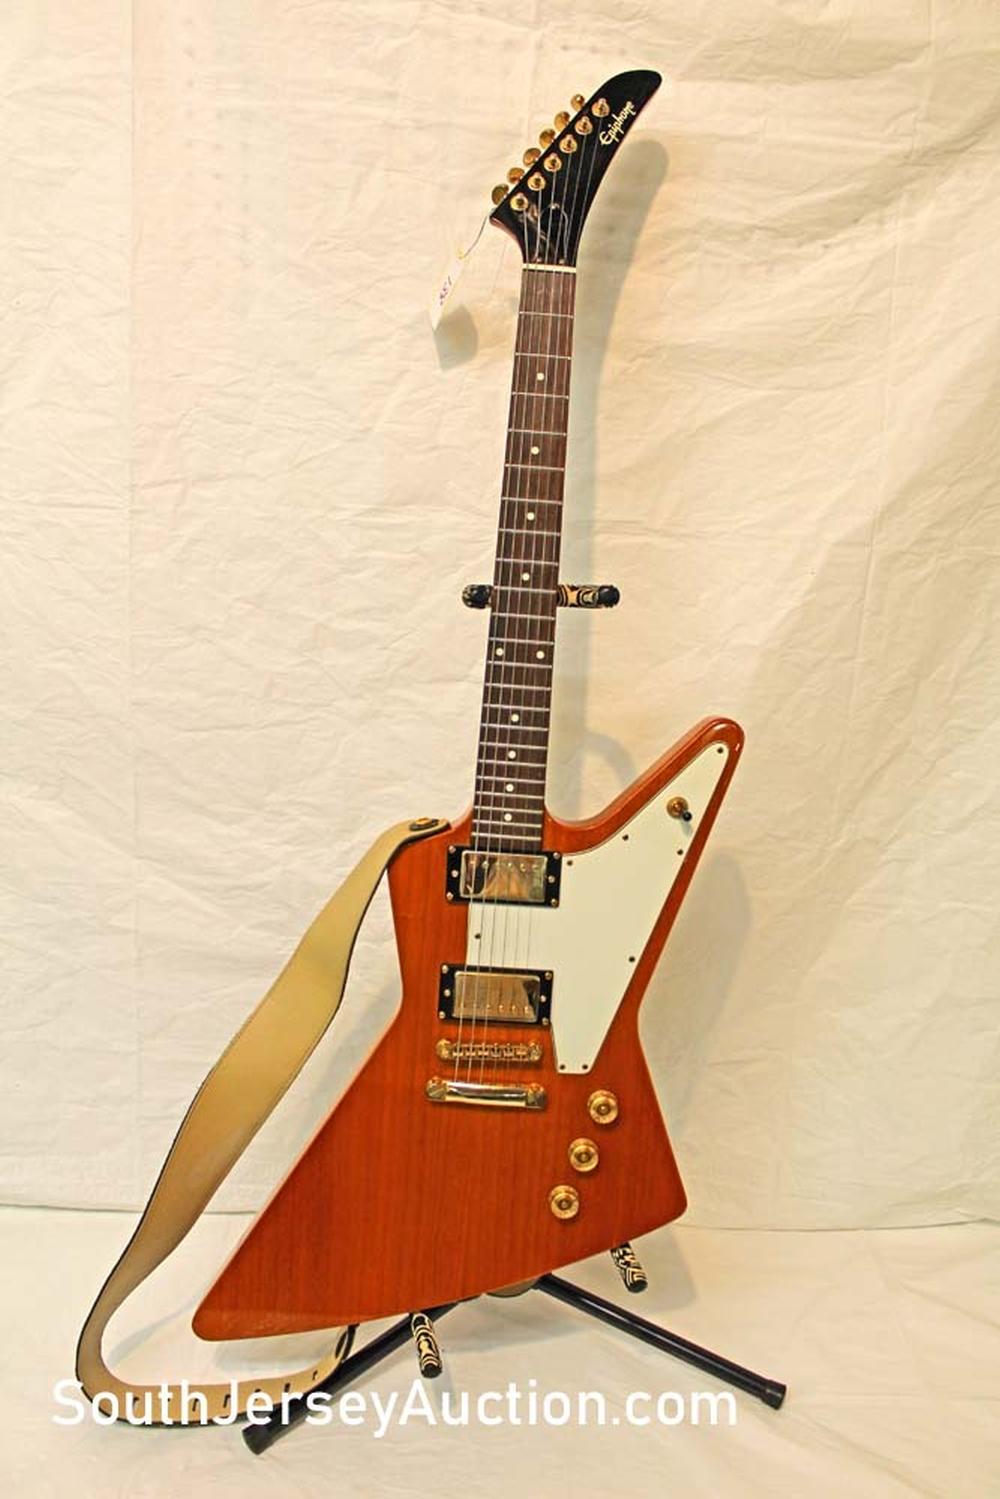 2015? Epiphone Explorer Body guitar, set neck, gold hardware, ebonized mahogany, s/n 311514250, excellent shape, all original